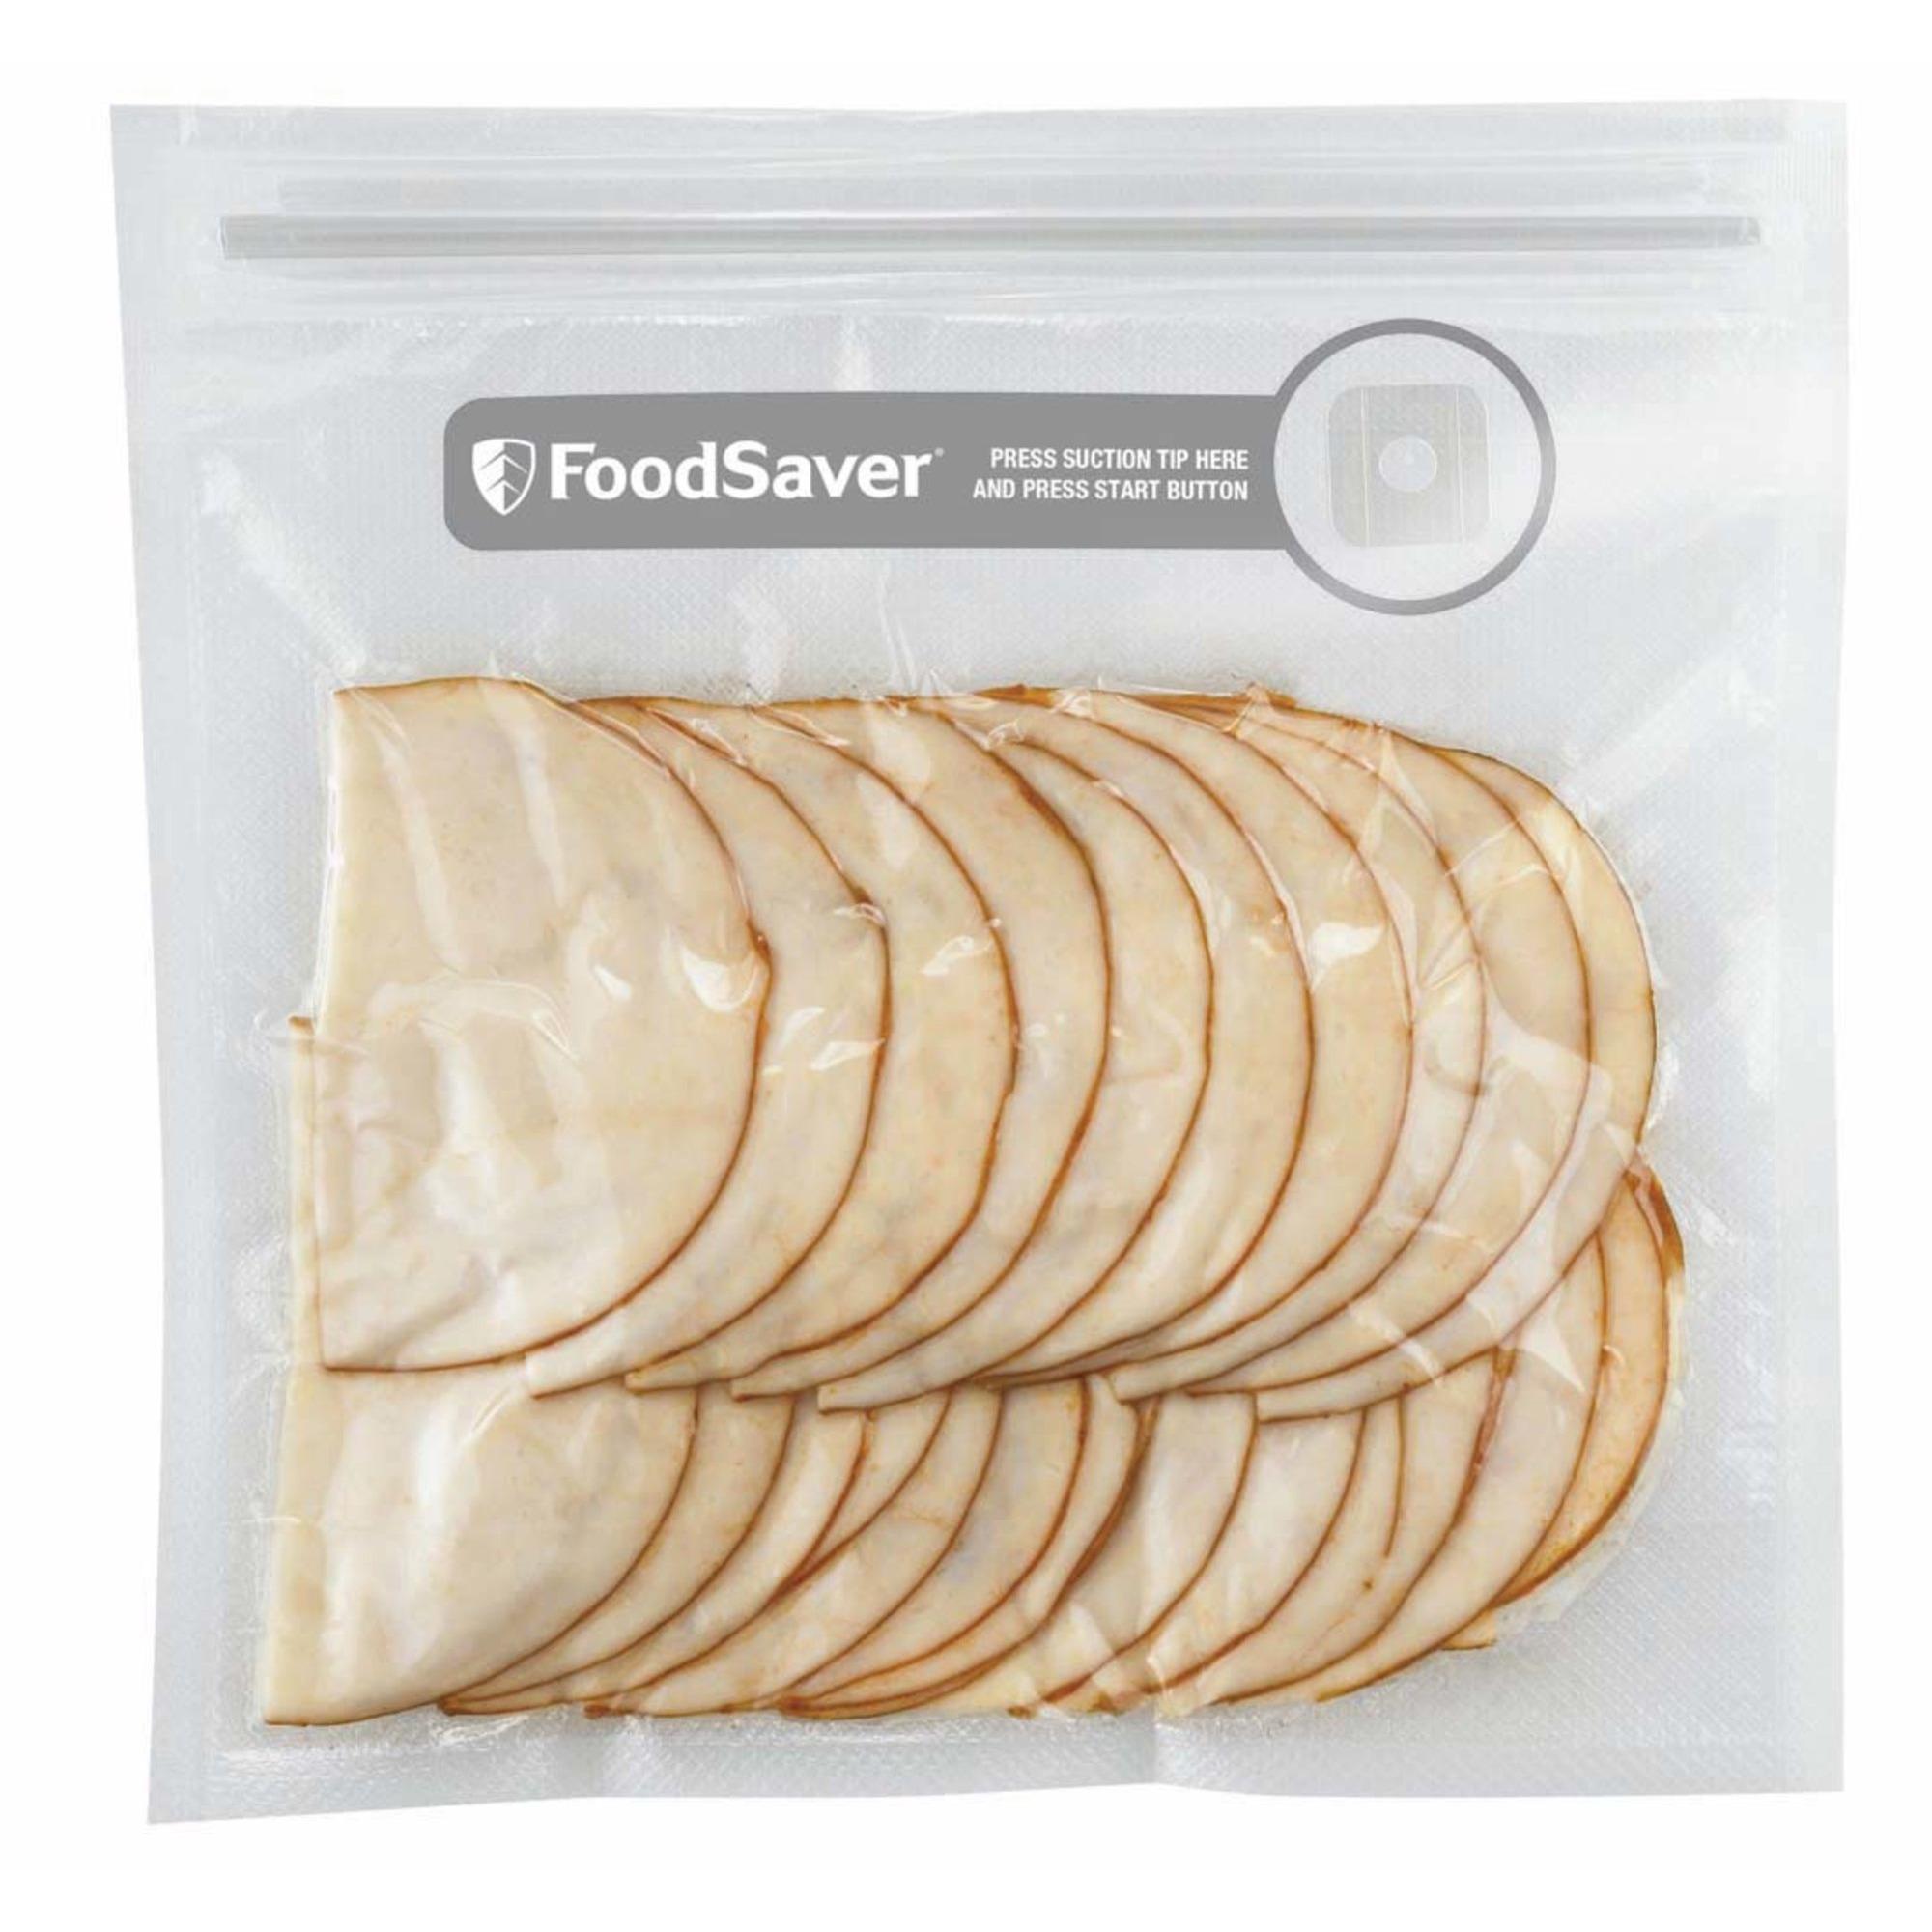 FoodSaver Zip-lockpåsar 095L 26 st